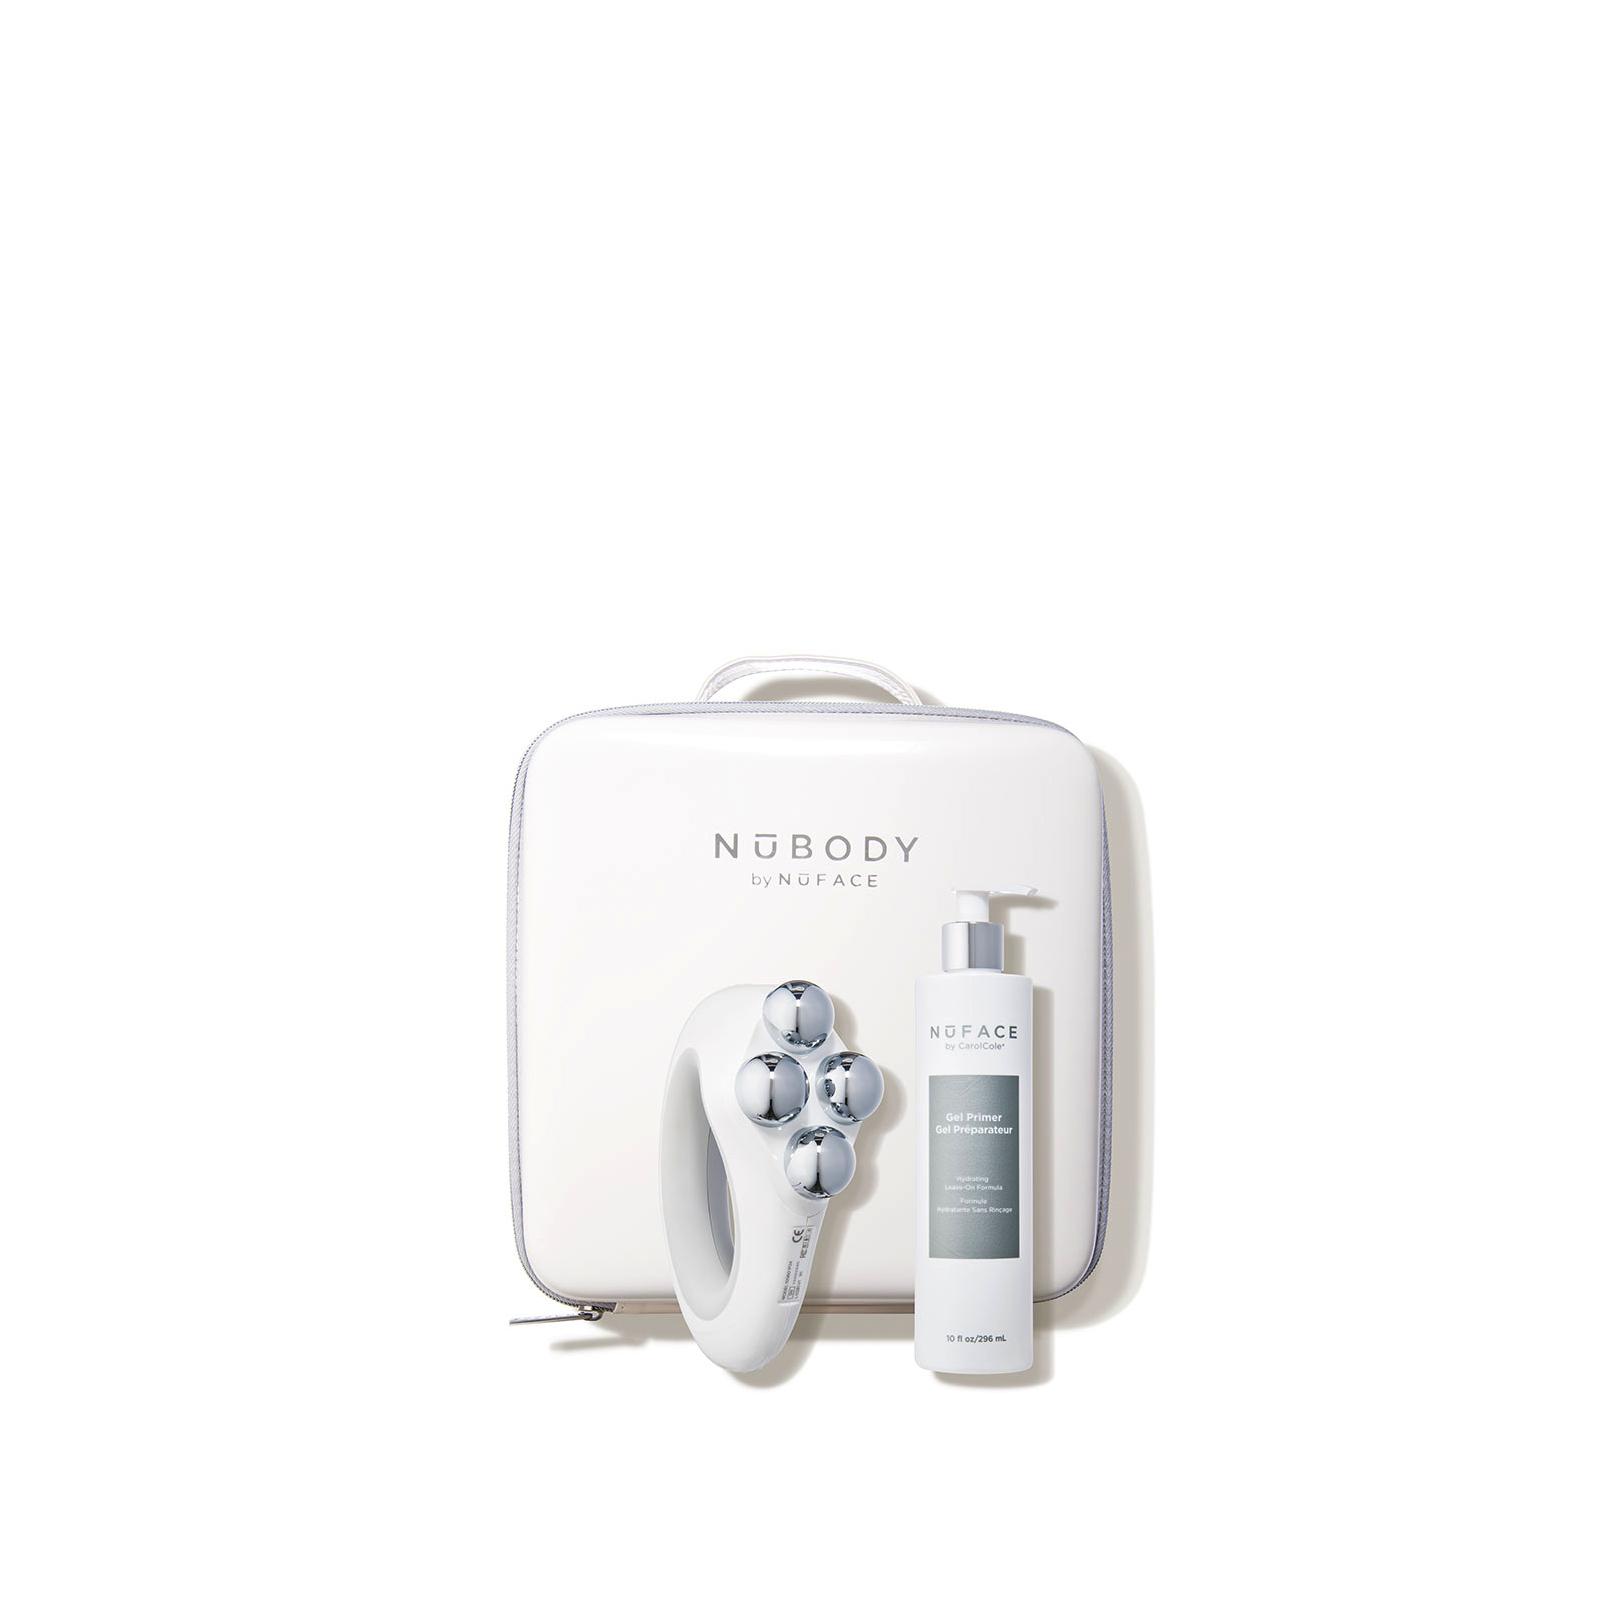 NuBODY Skin Toning Device